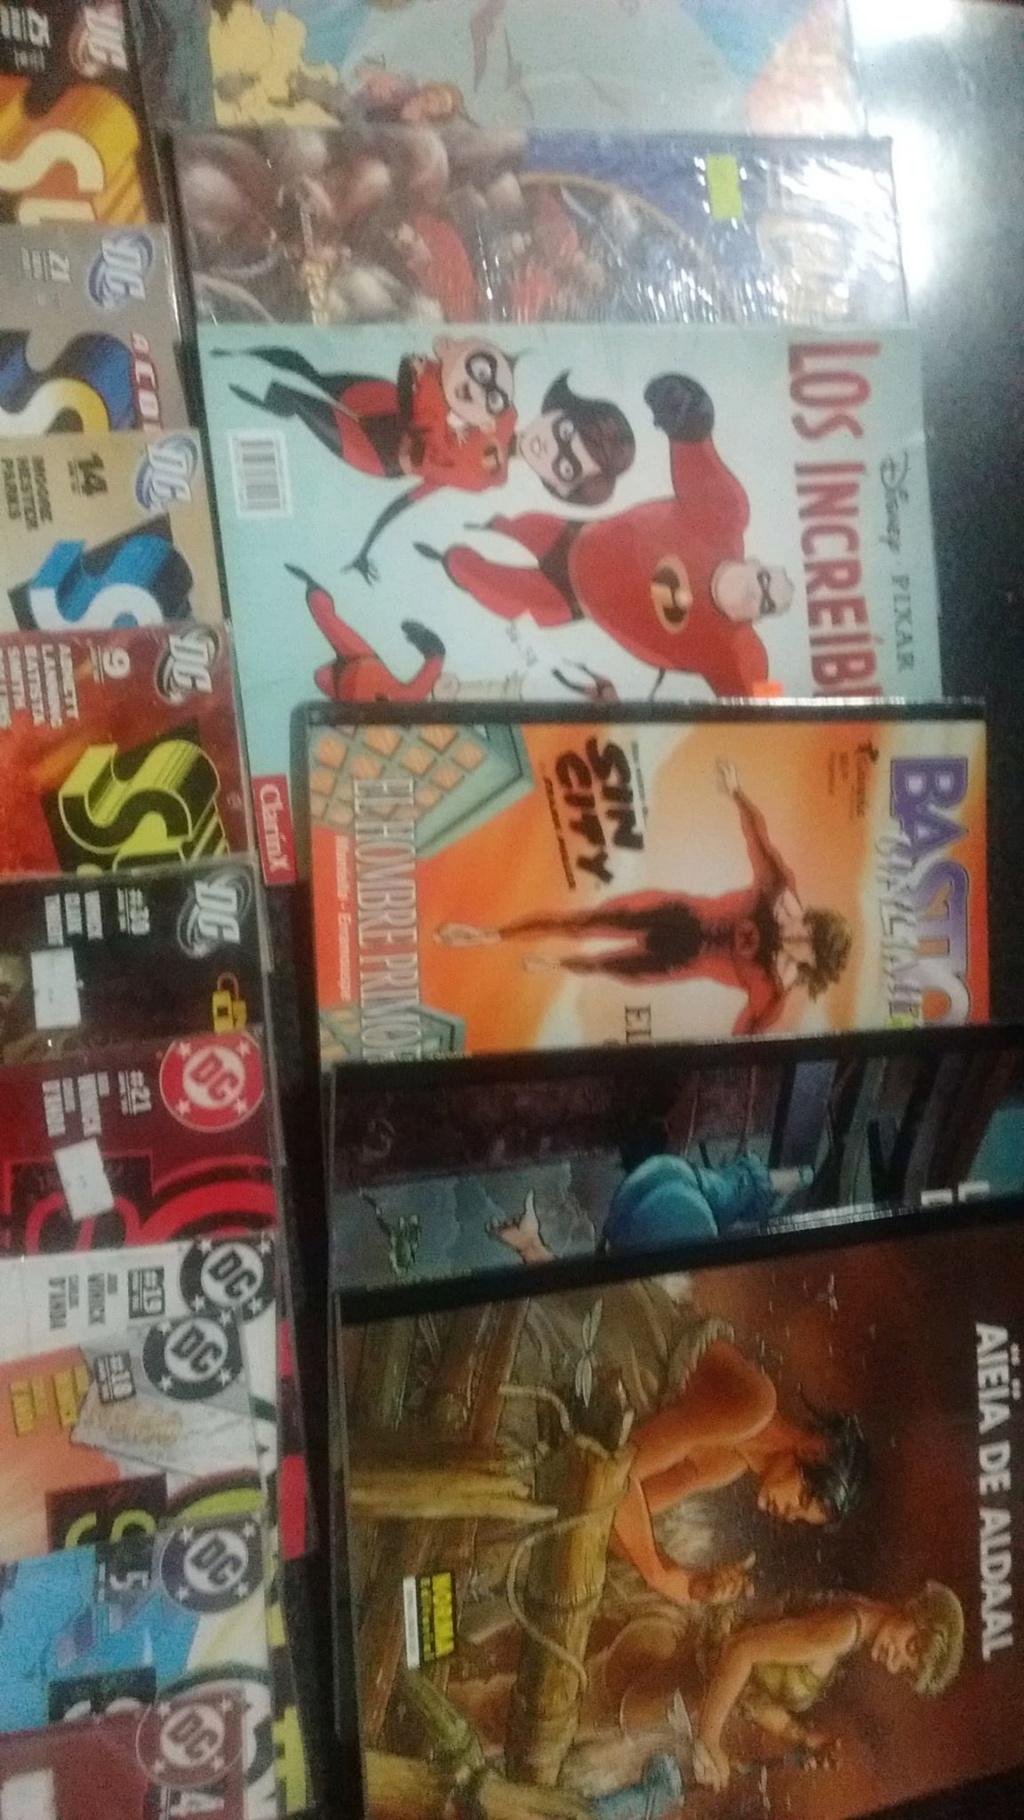 20 - [Comics] Siguen las adquisiciones 2018 - Página 4 Compra13